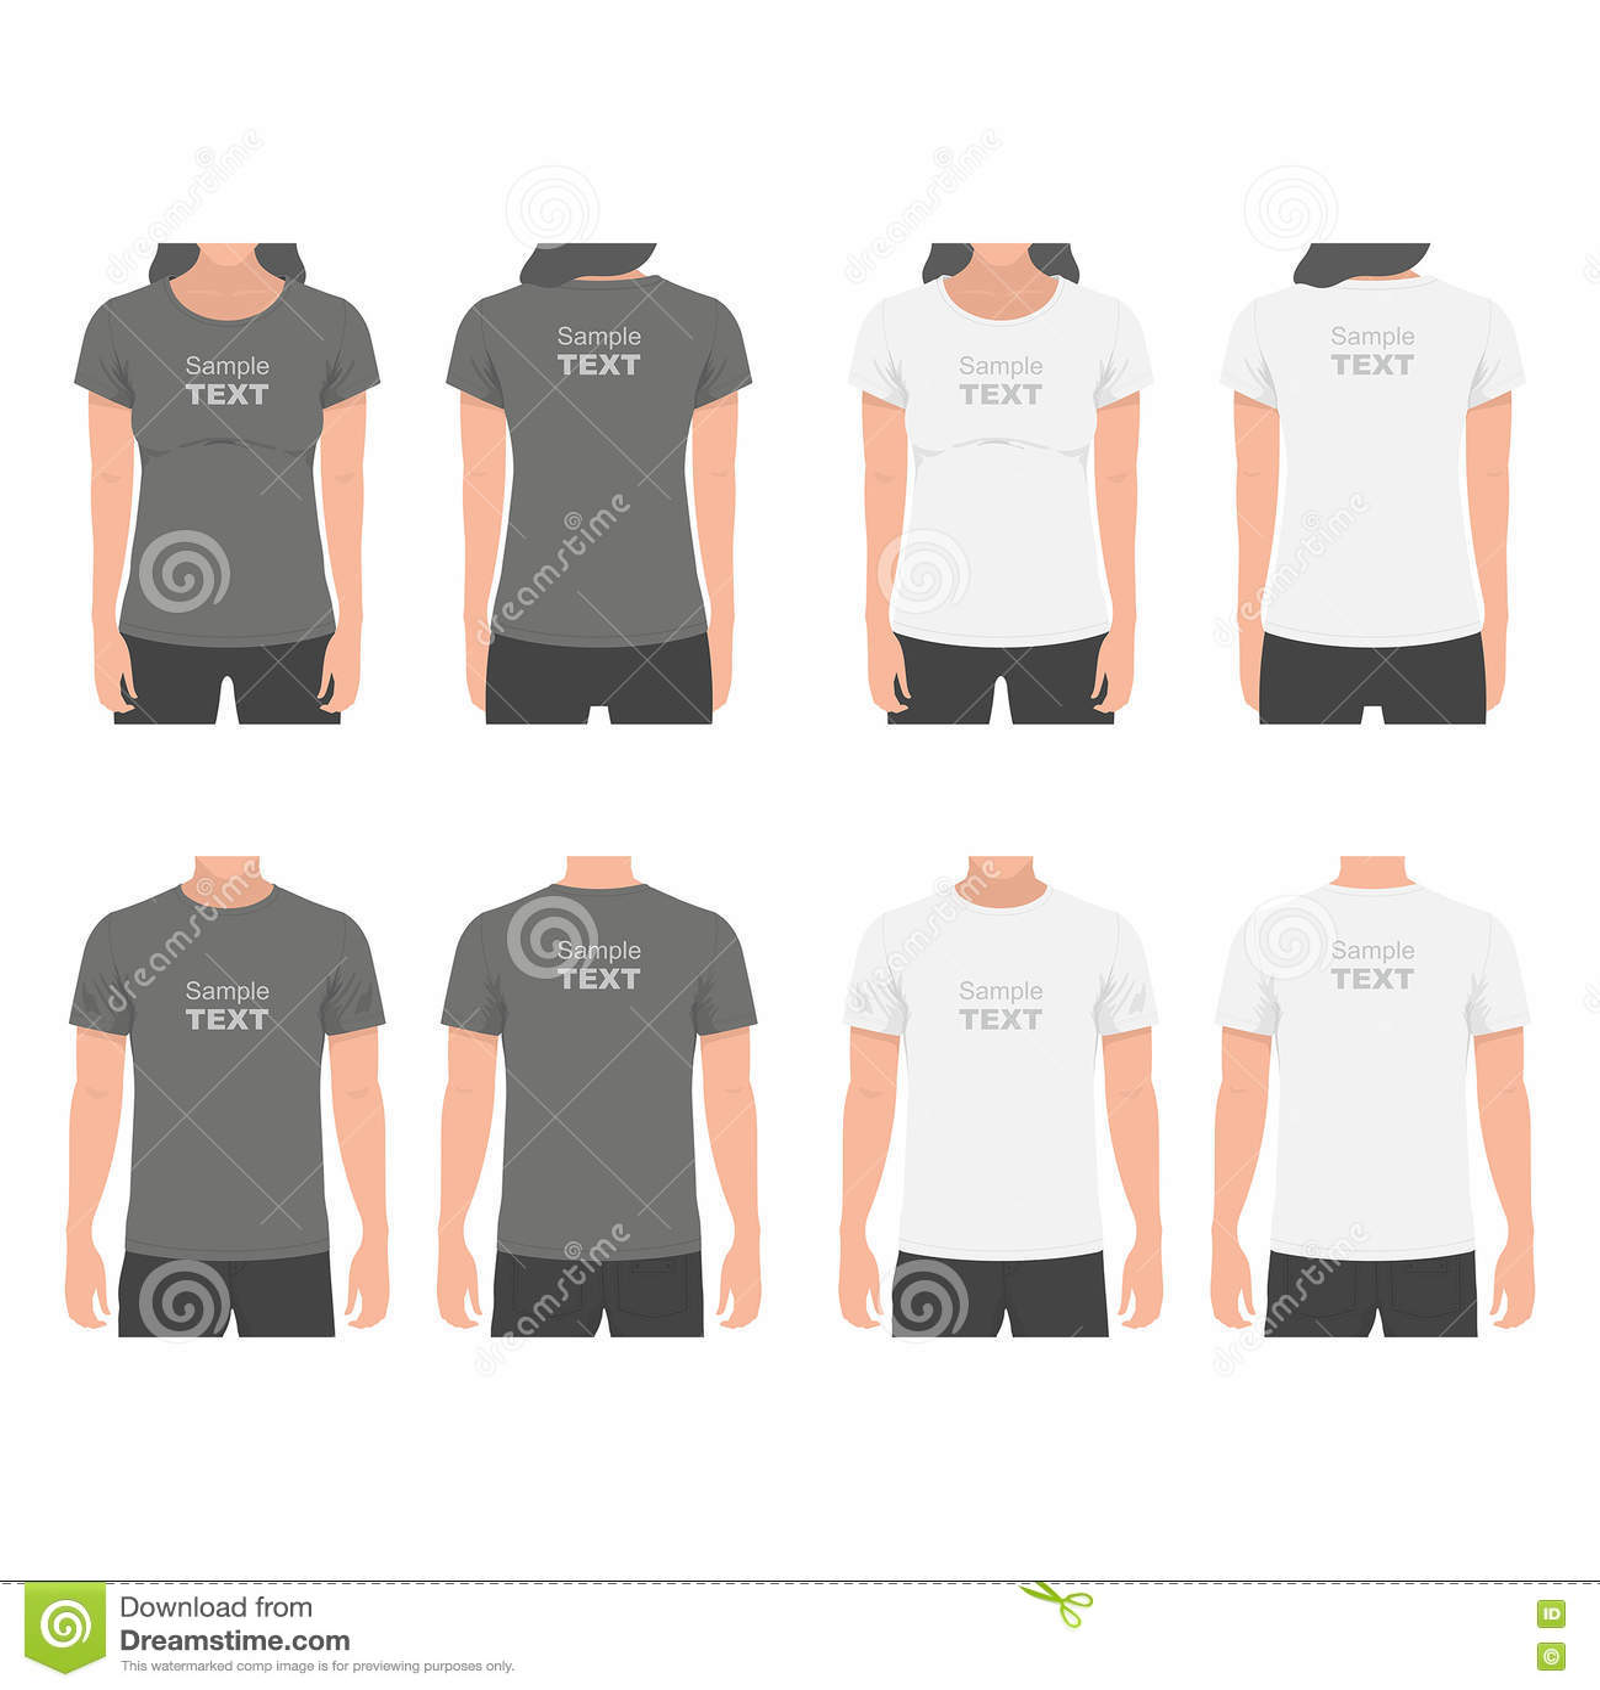 Human design t shirt - Back Body Design Front Human Men Shirt